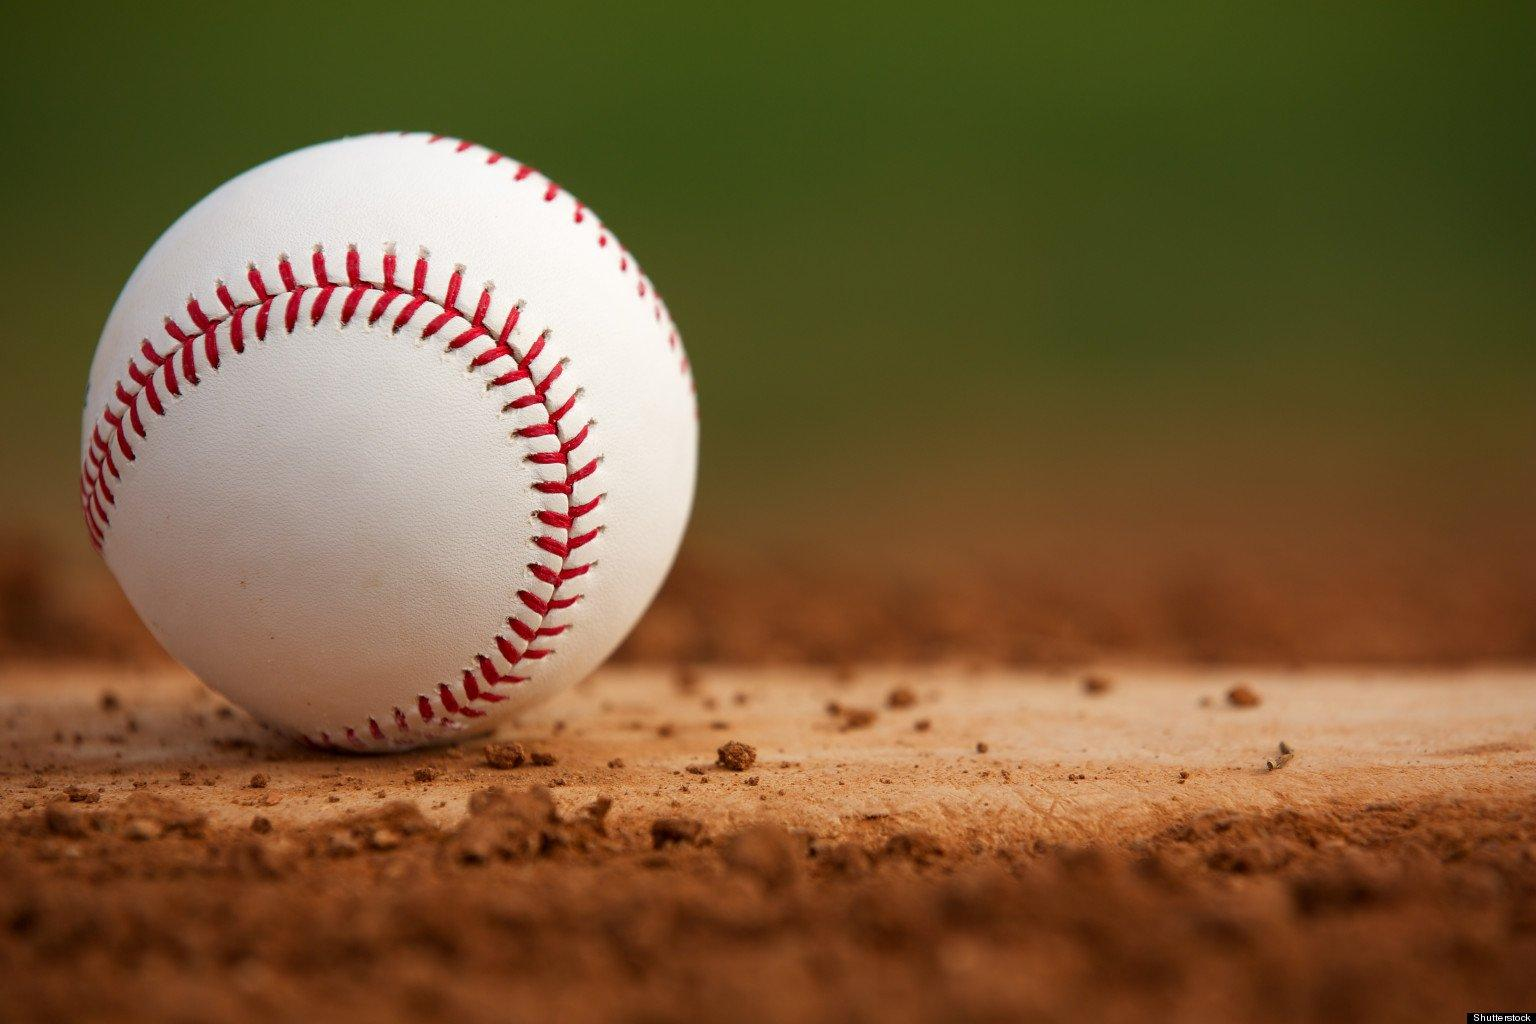 The baseball team won 9-0 against Brashear to cap off senior recognition night